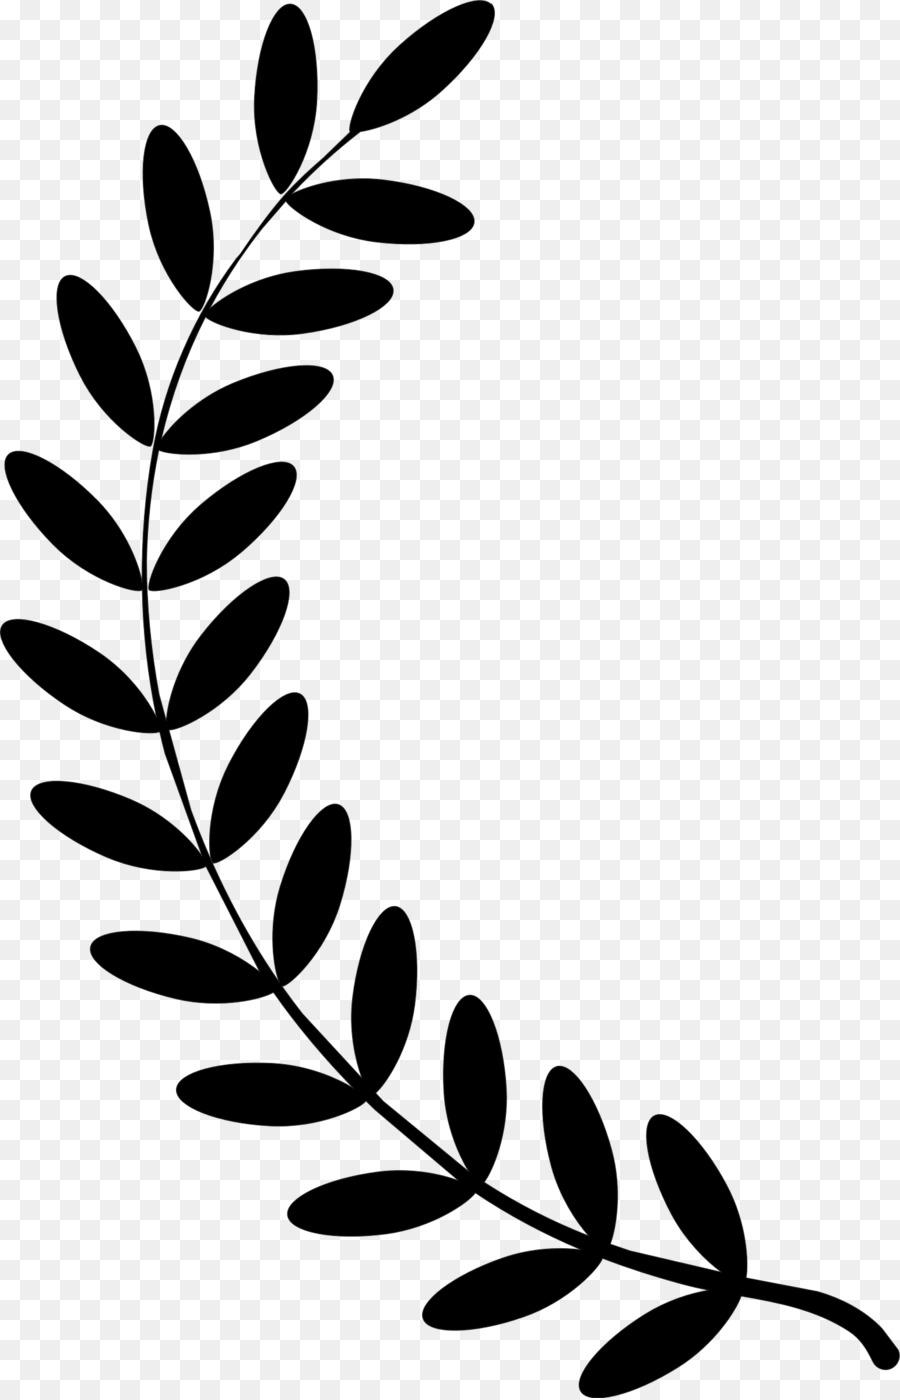 Laurel wreath clip art. Branch clipart olive branch